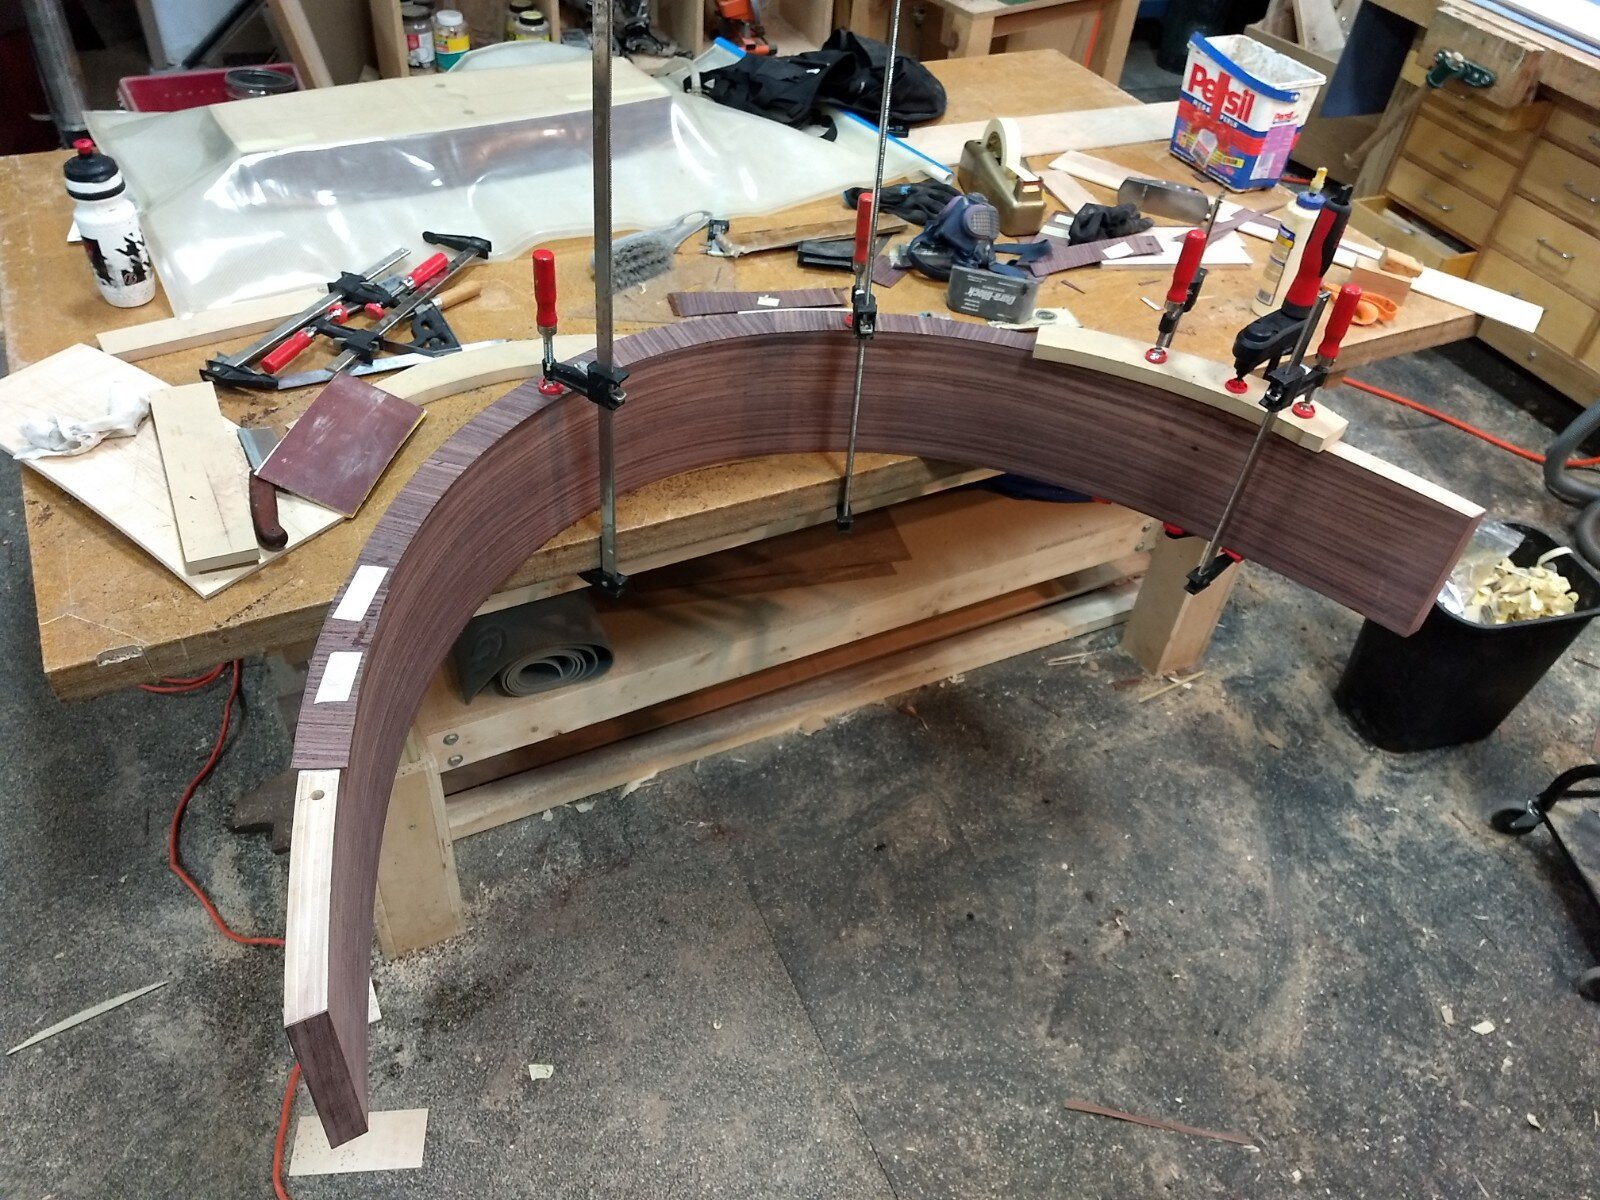 Clamping on edge veneer segments